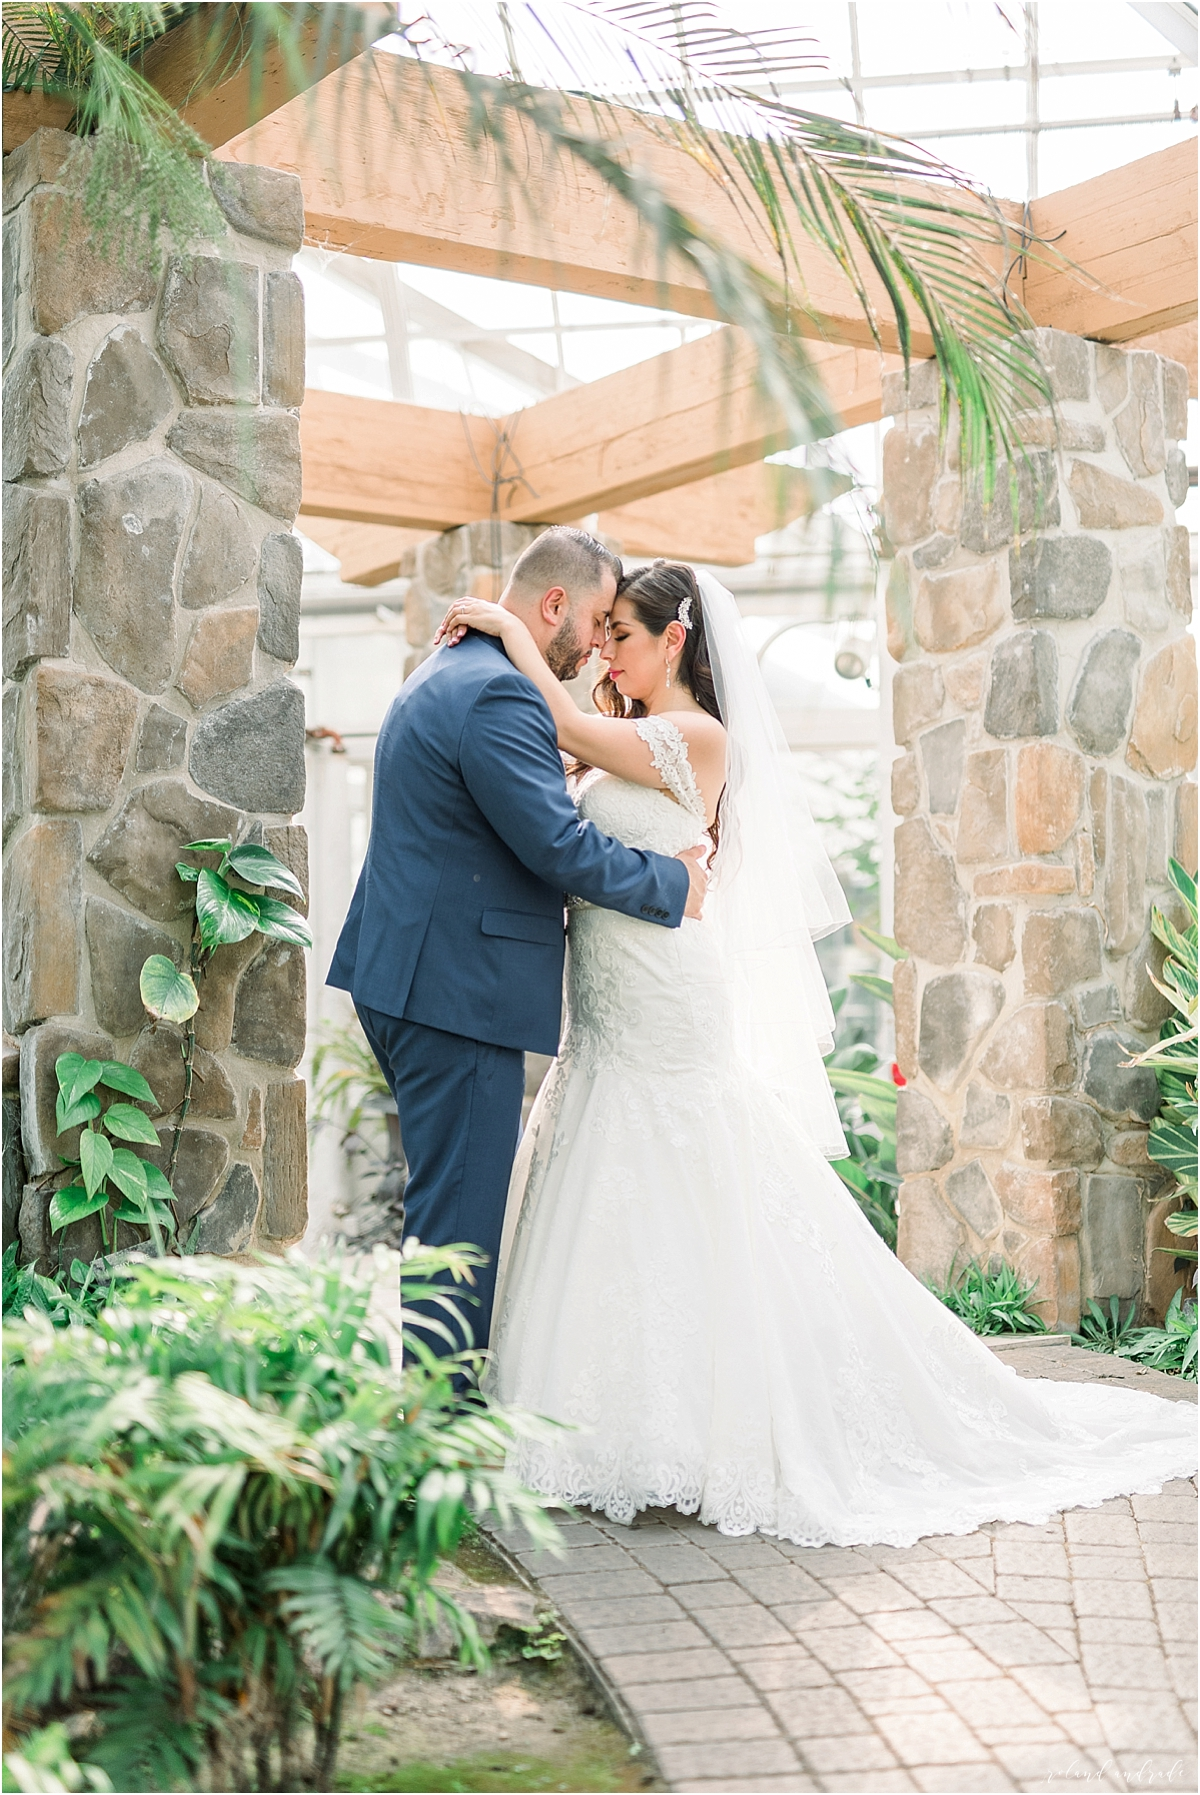 Rancho Los Guzman Wedding Joliet, Joliet Wedding, Joliet Wedding Photographer, Chicago Wedding Photographer, Best Photographer In Joliet, Best Photographer In Chicago, Light And Airy Photographer Chicago_0054.jpg